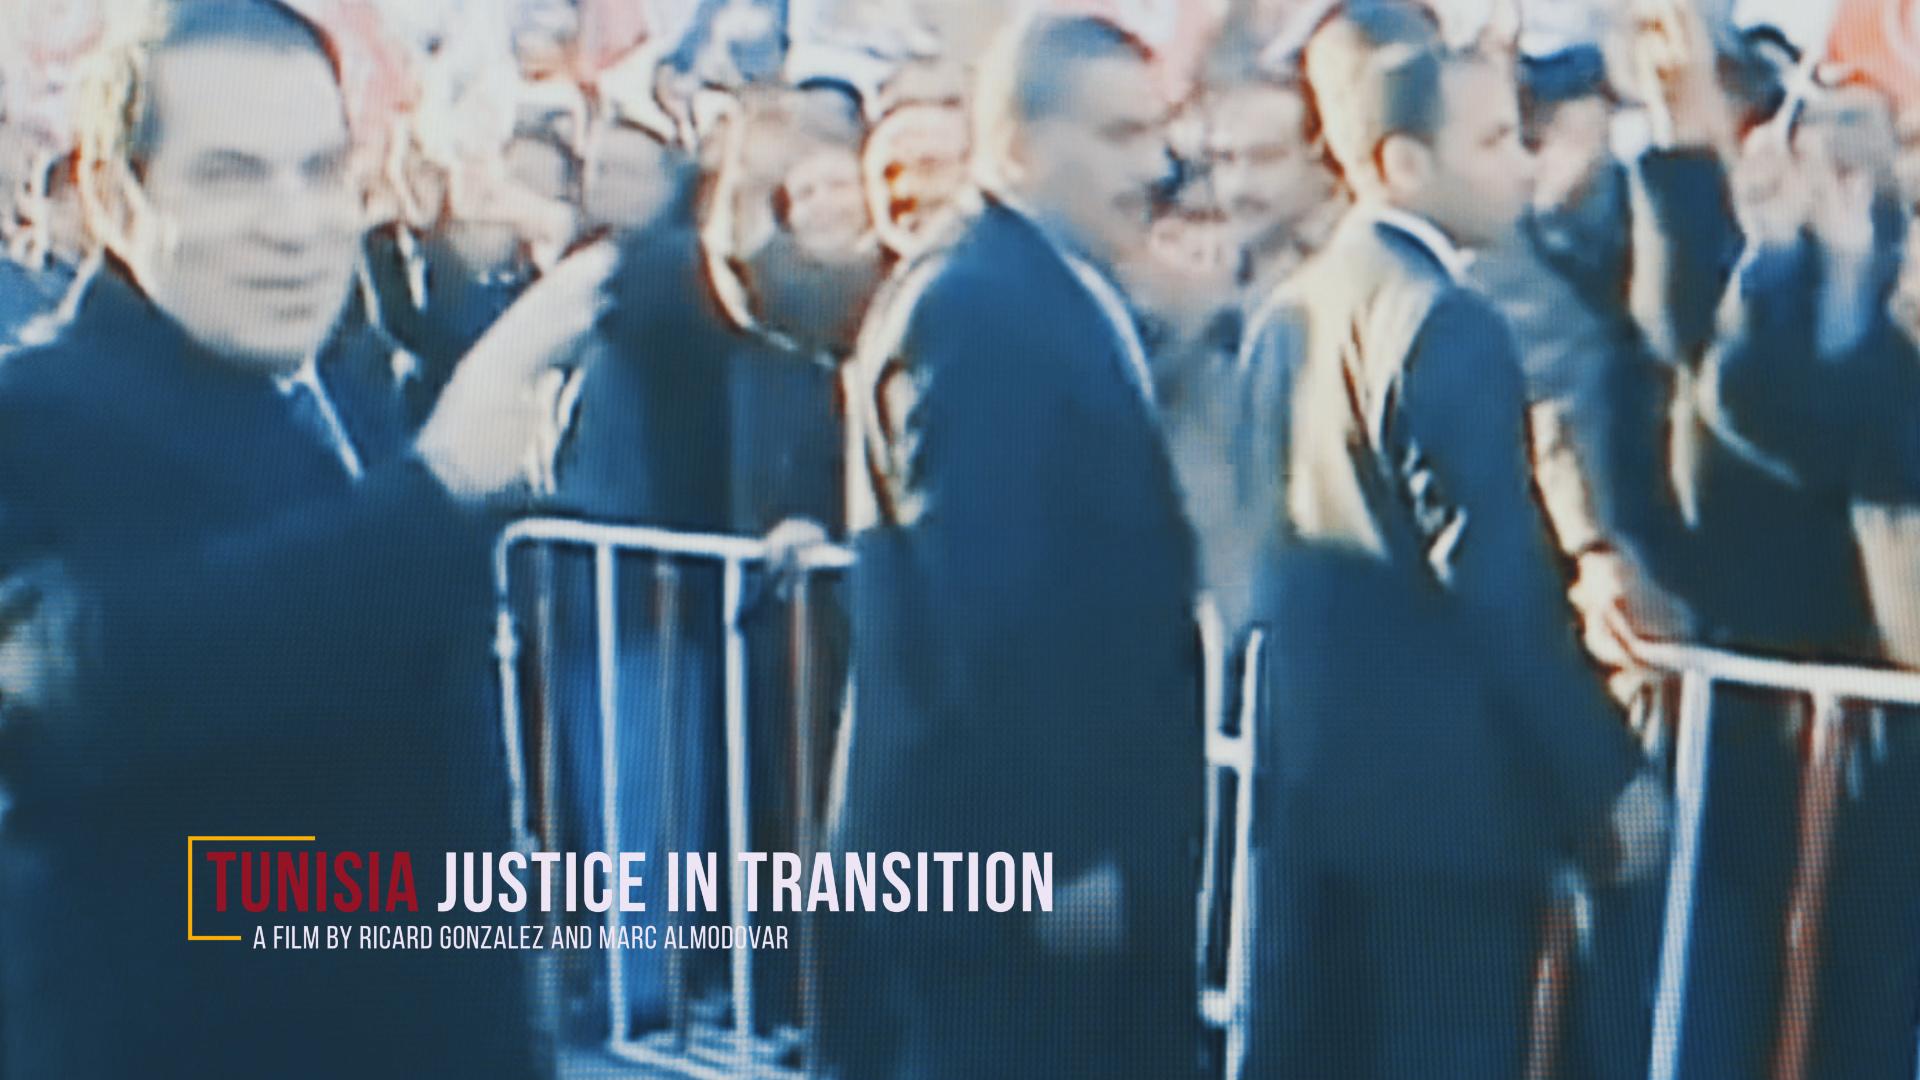 Trailer documentaire IVD Tunisie_controverse 27-06